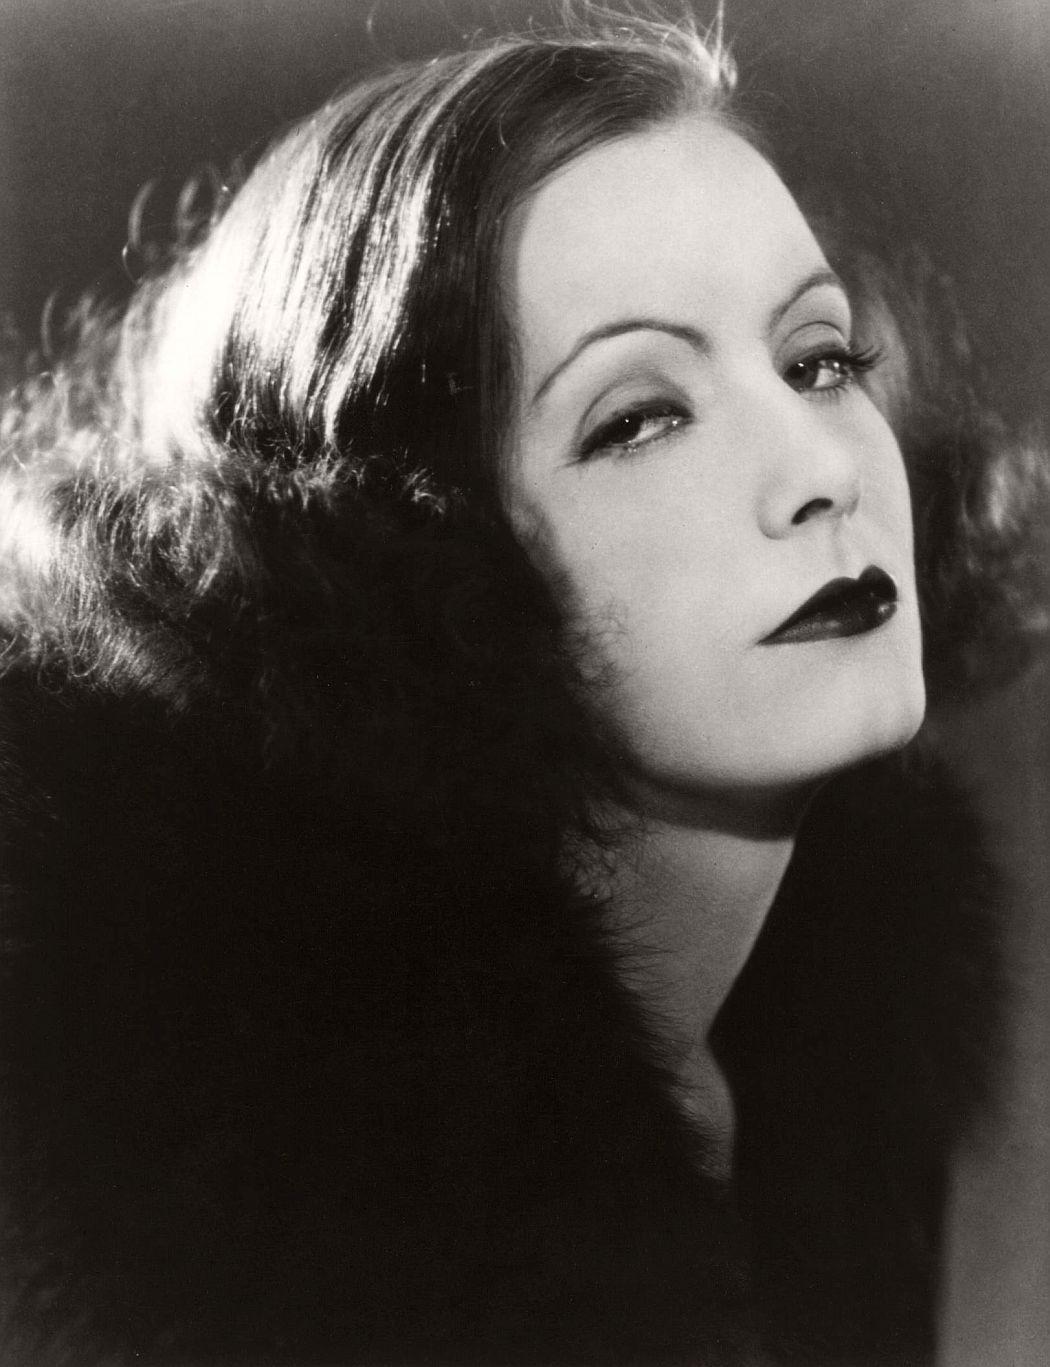 vintage-greta-garbo-portraits-1920s-1930s-08